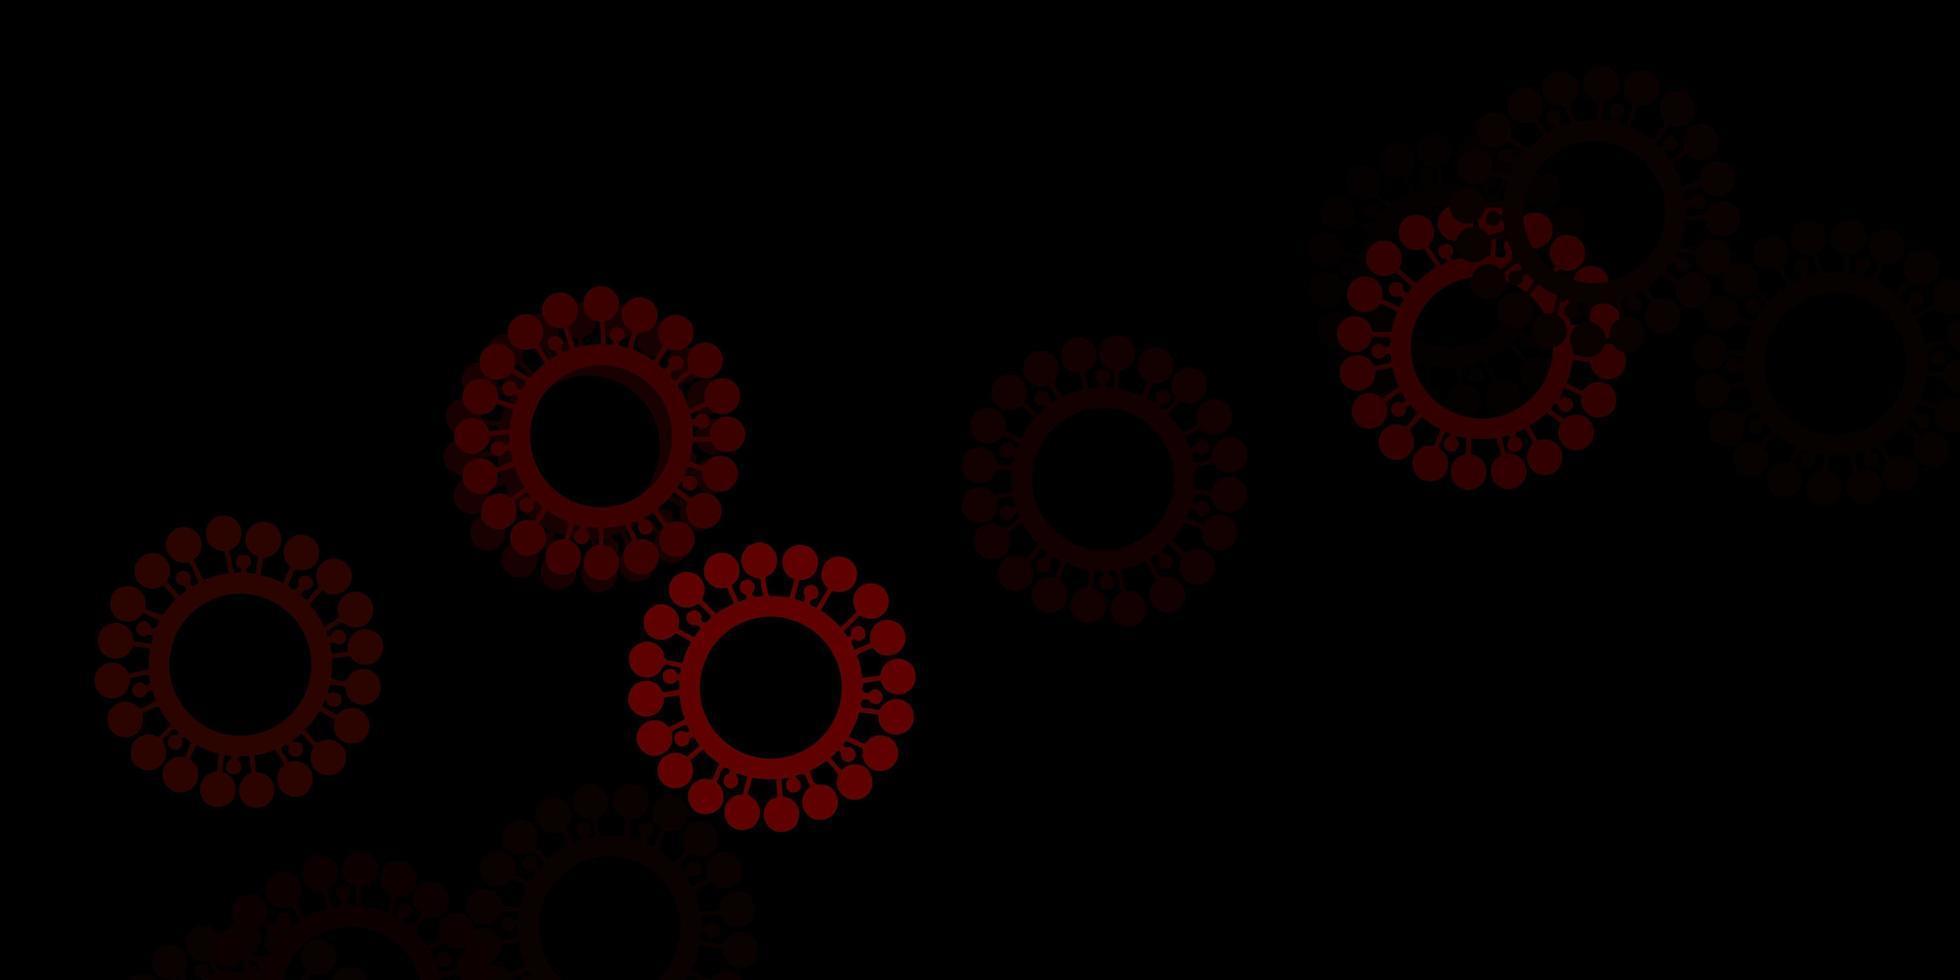 Fondo de vector marrón oscuro con símbolos covid-19